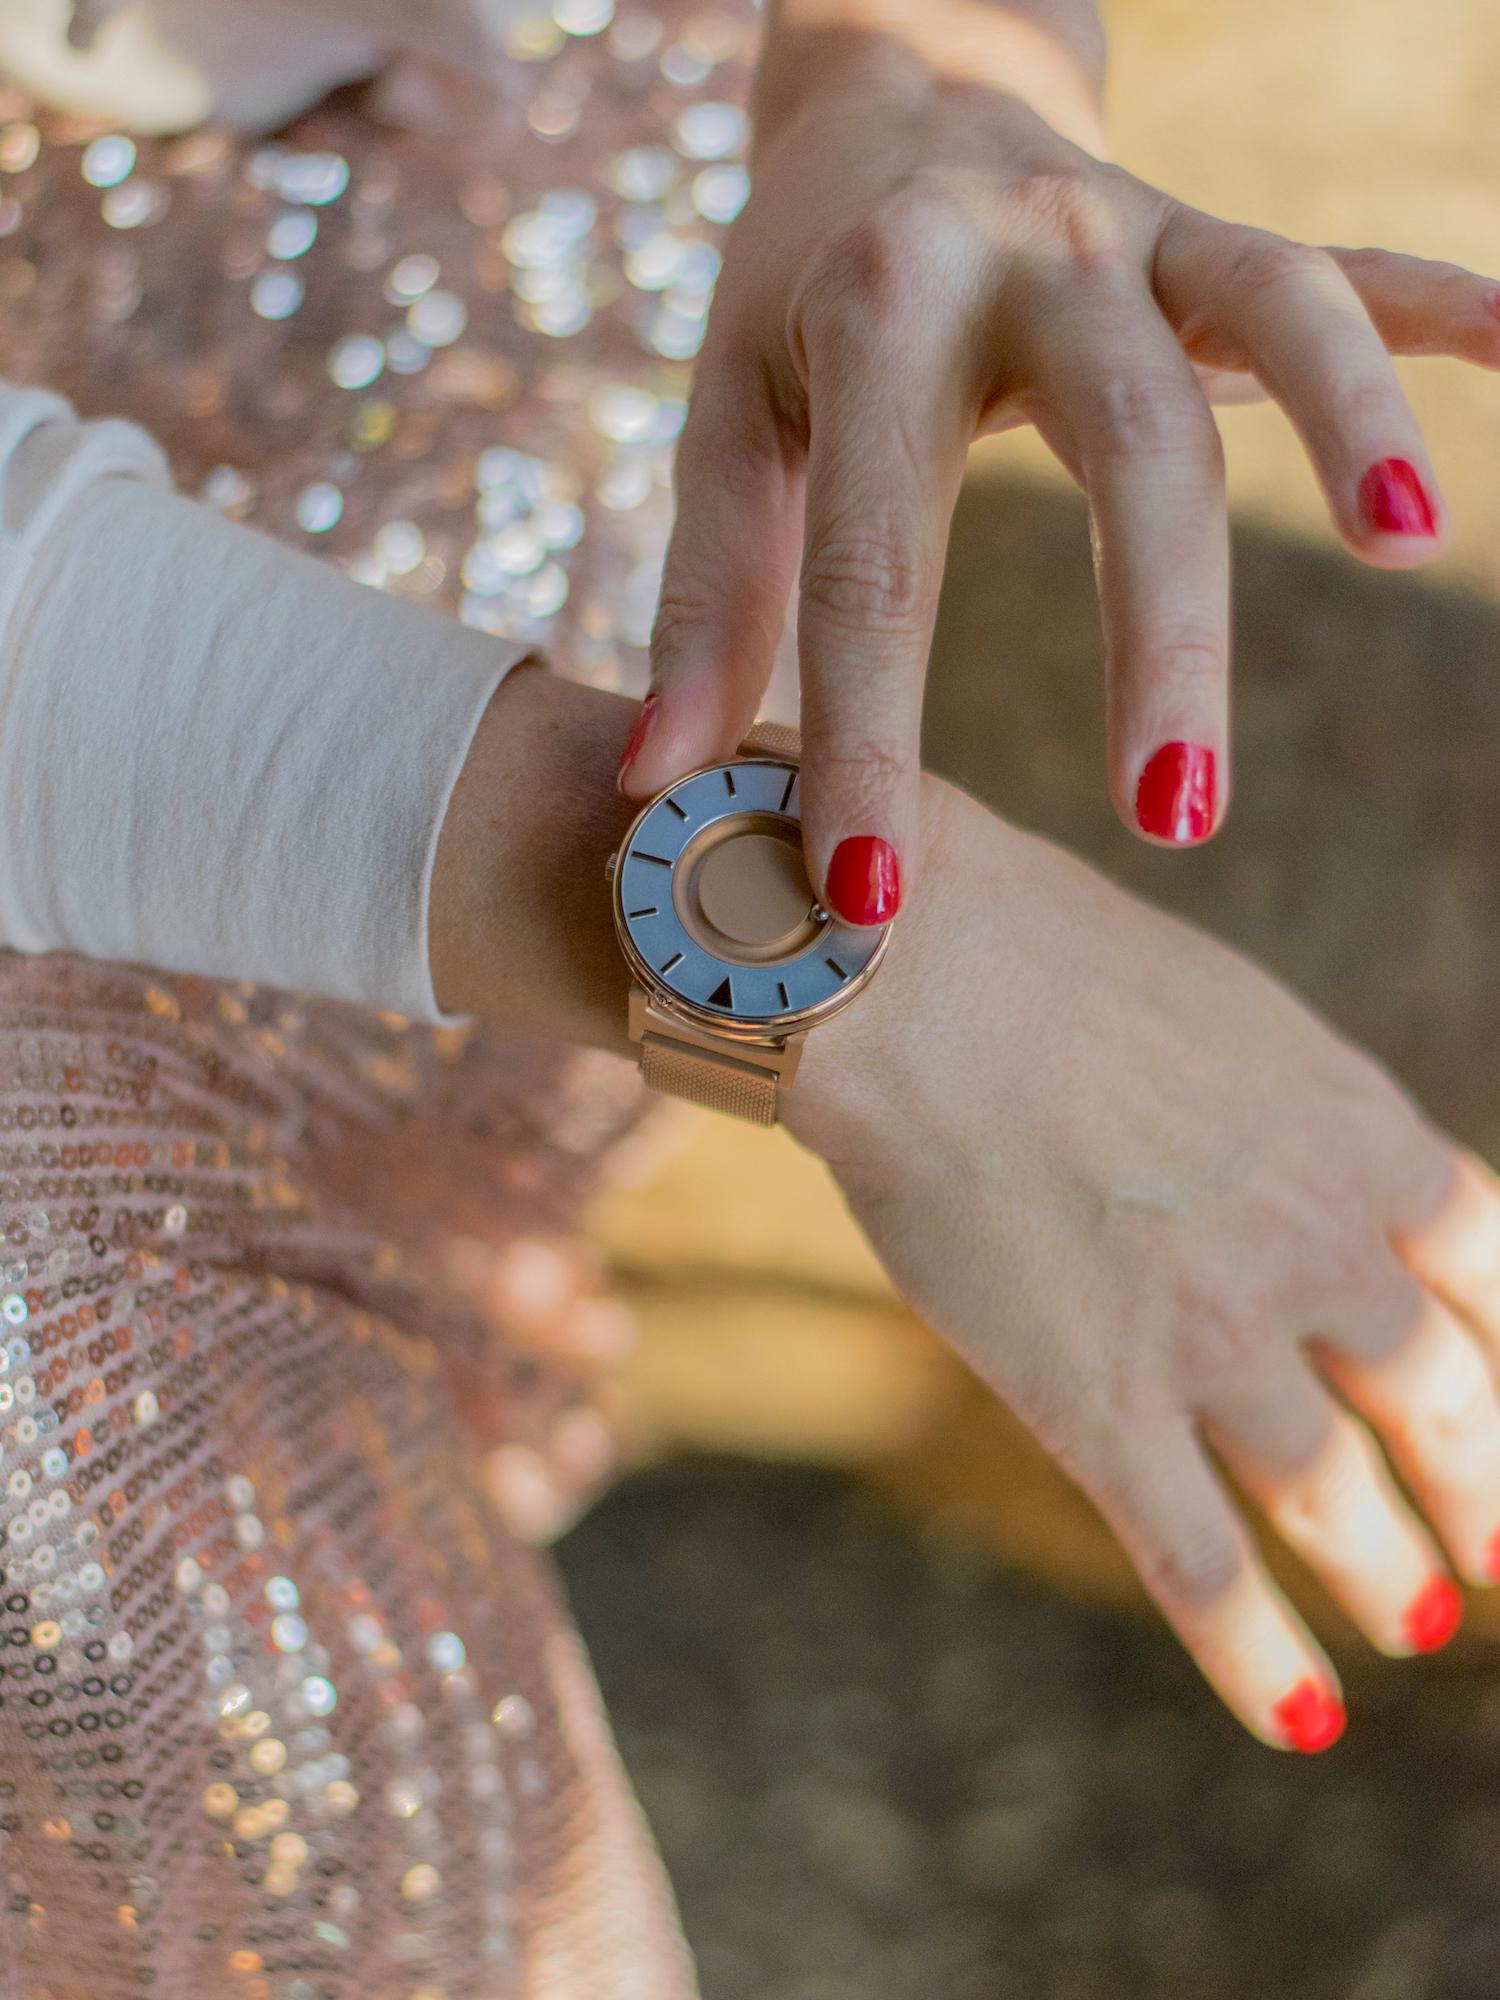 trajnosta moda beautyfull blog nika veger 485